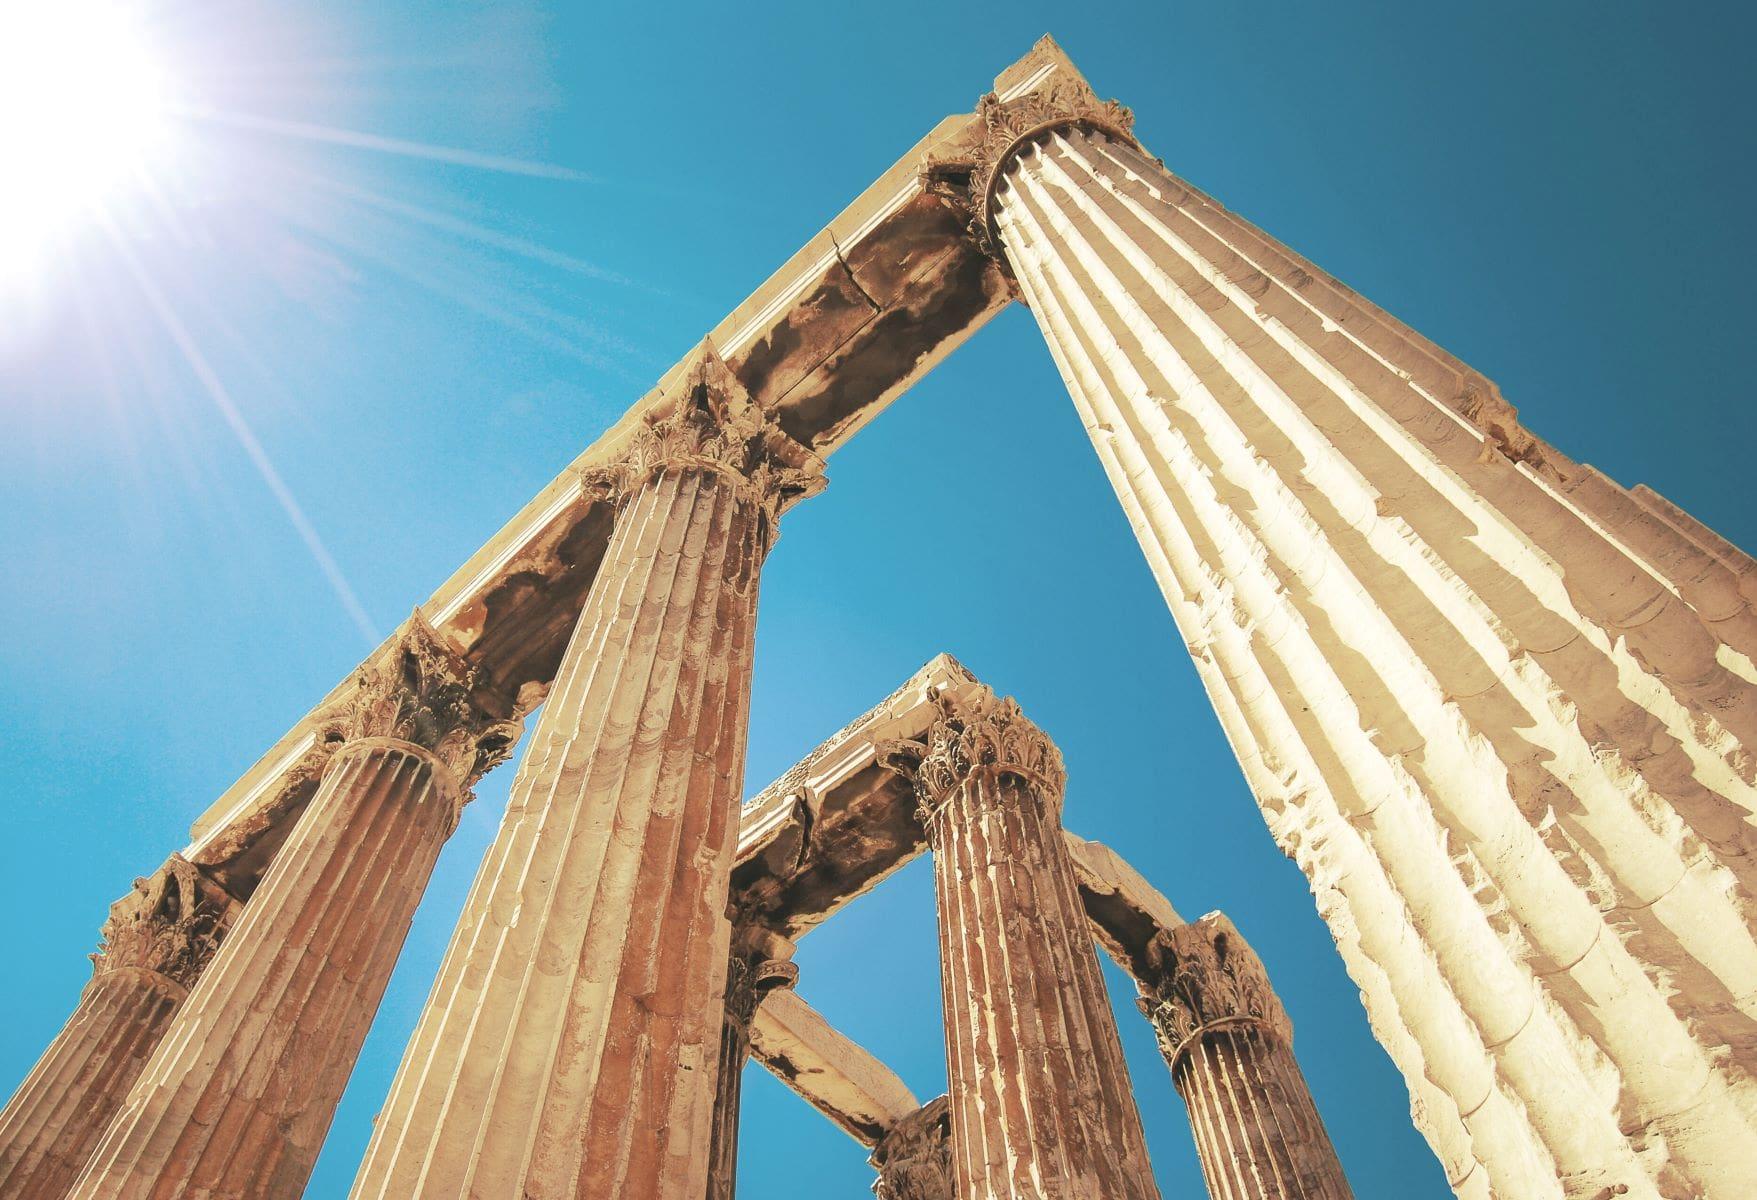 corinthian columns angled up